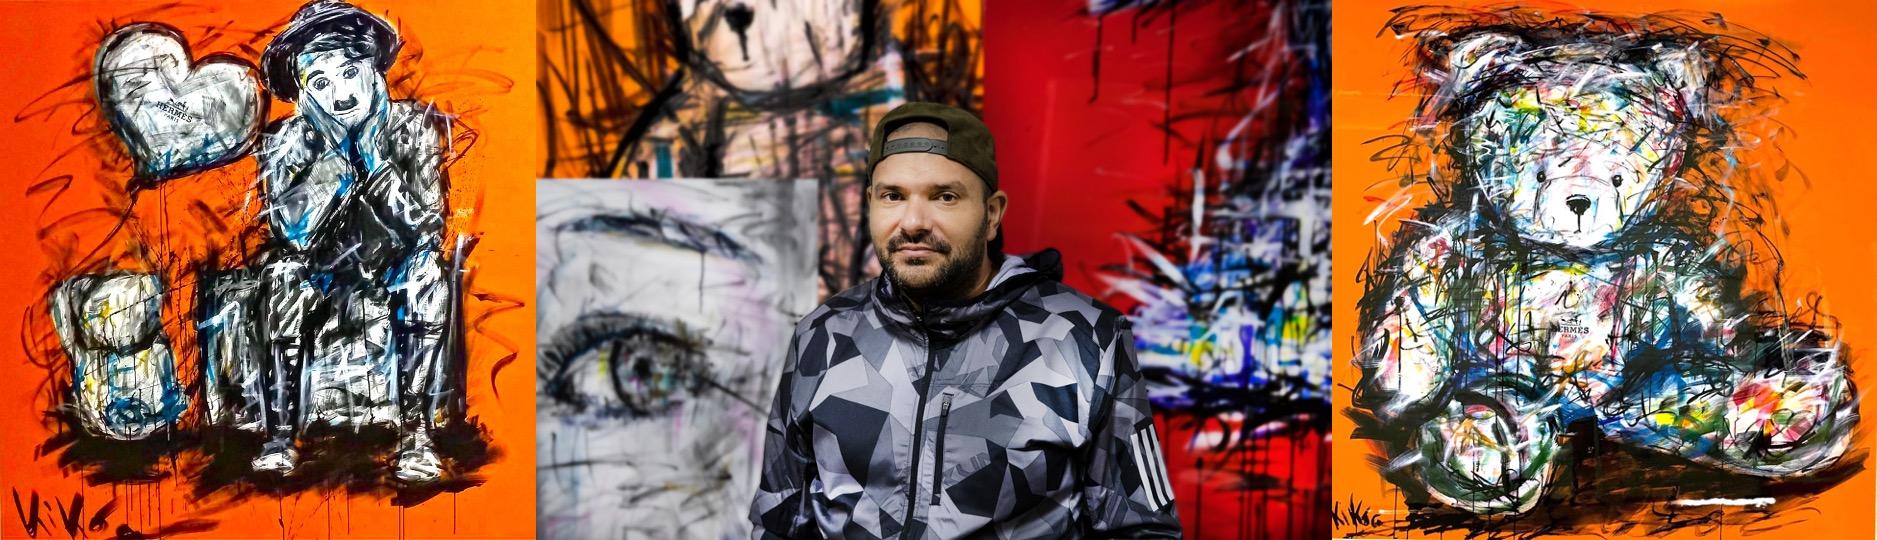 kiko-artiste-peinture-street-art